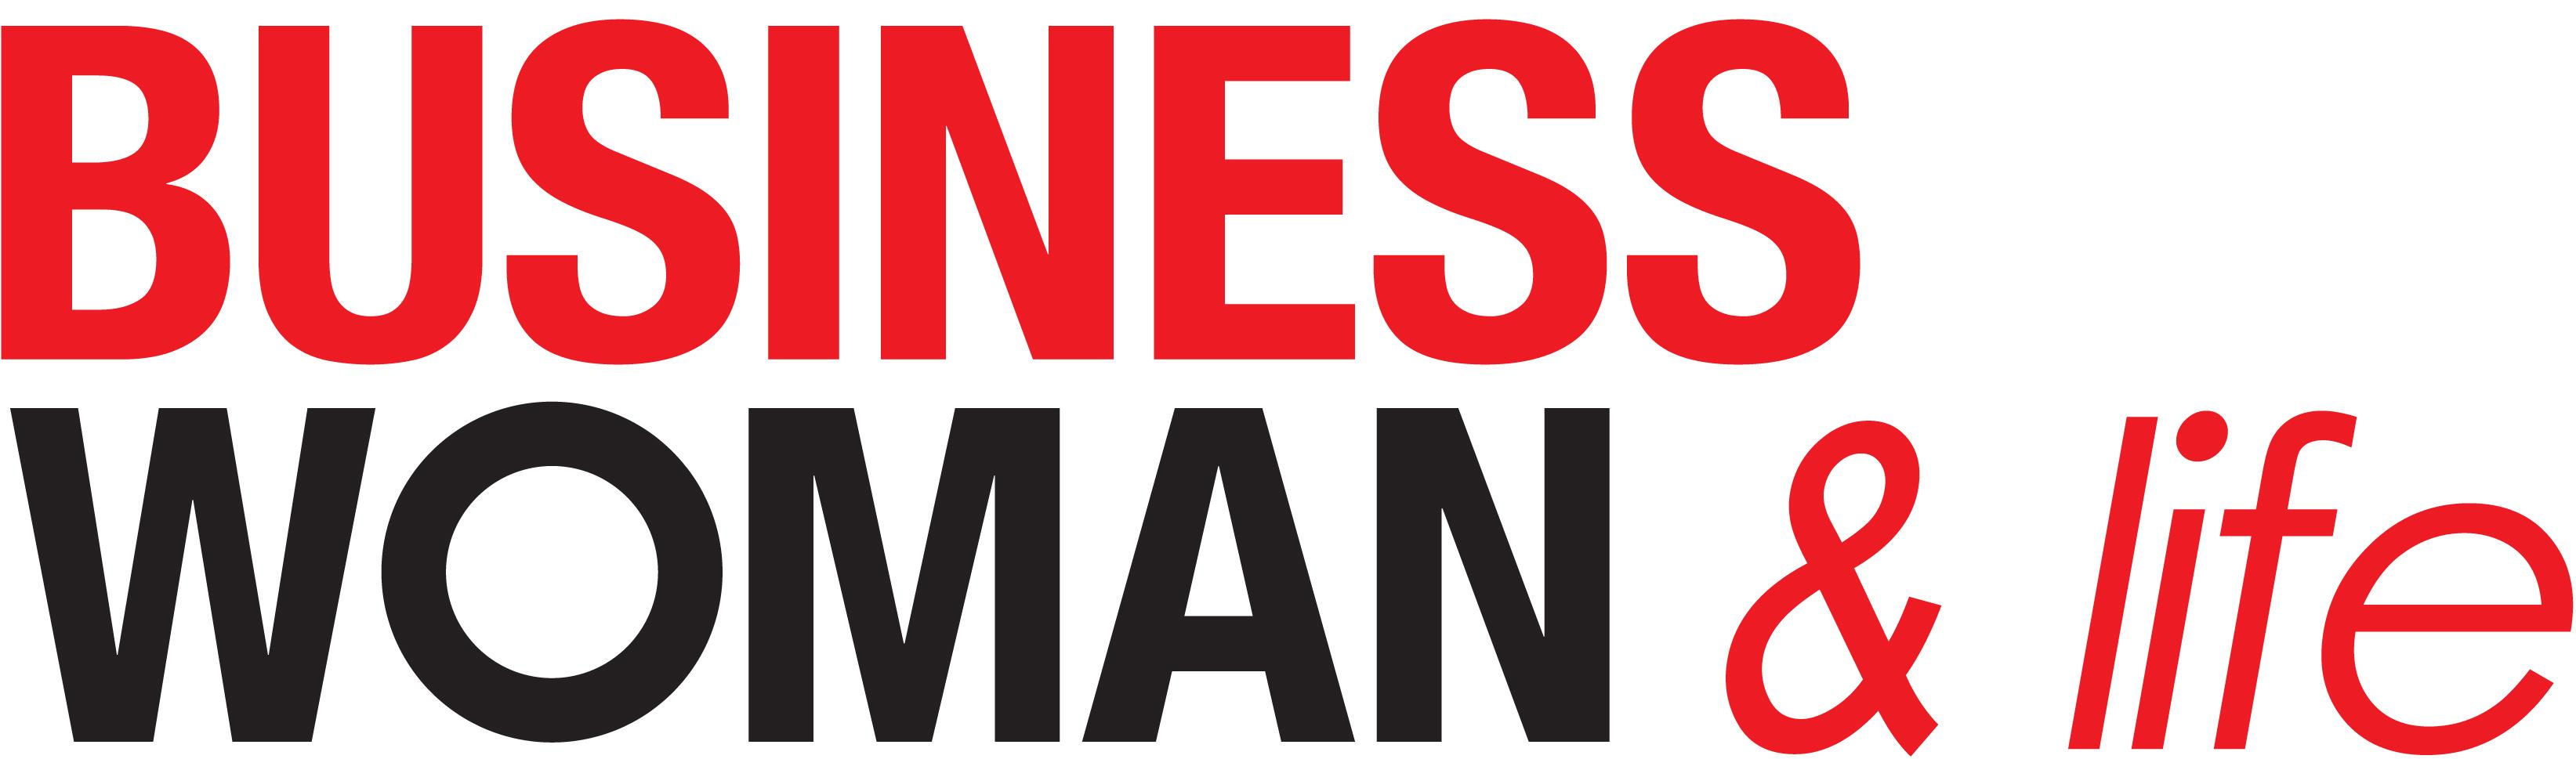 Magazyn Businesswoman & life